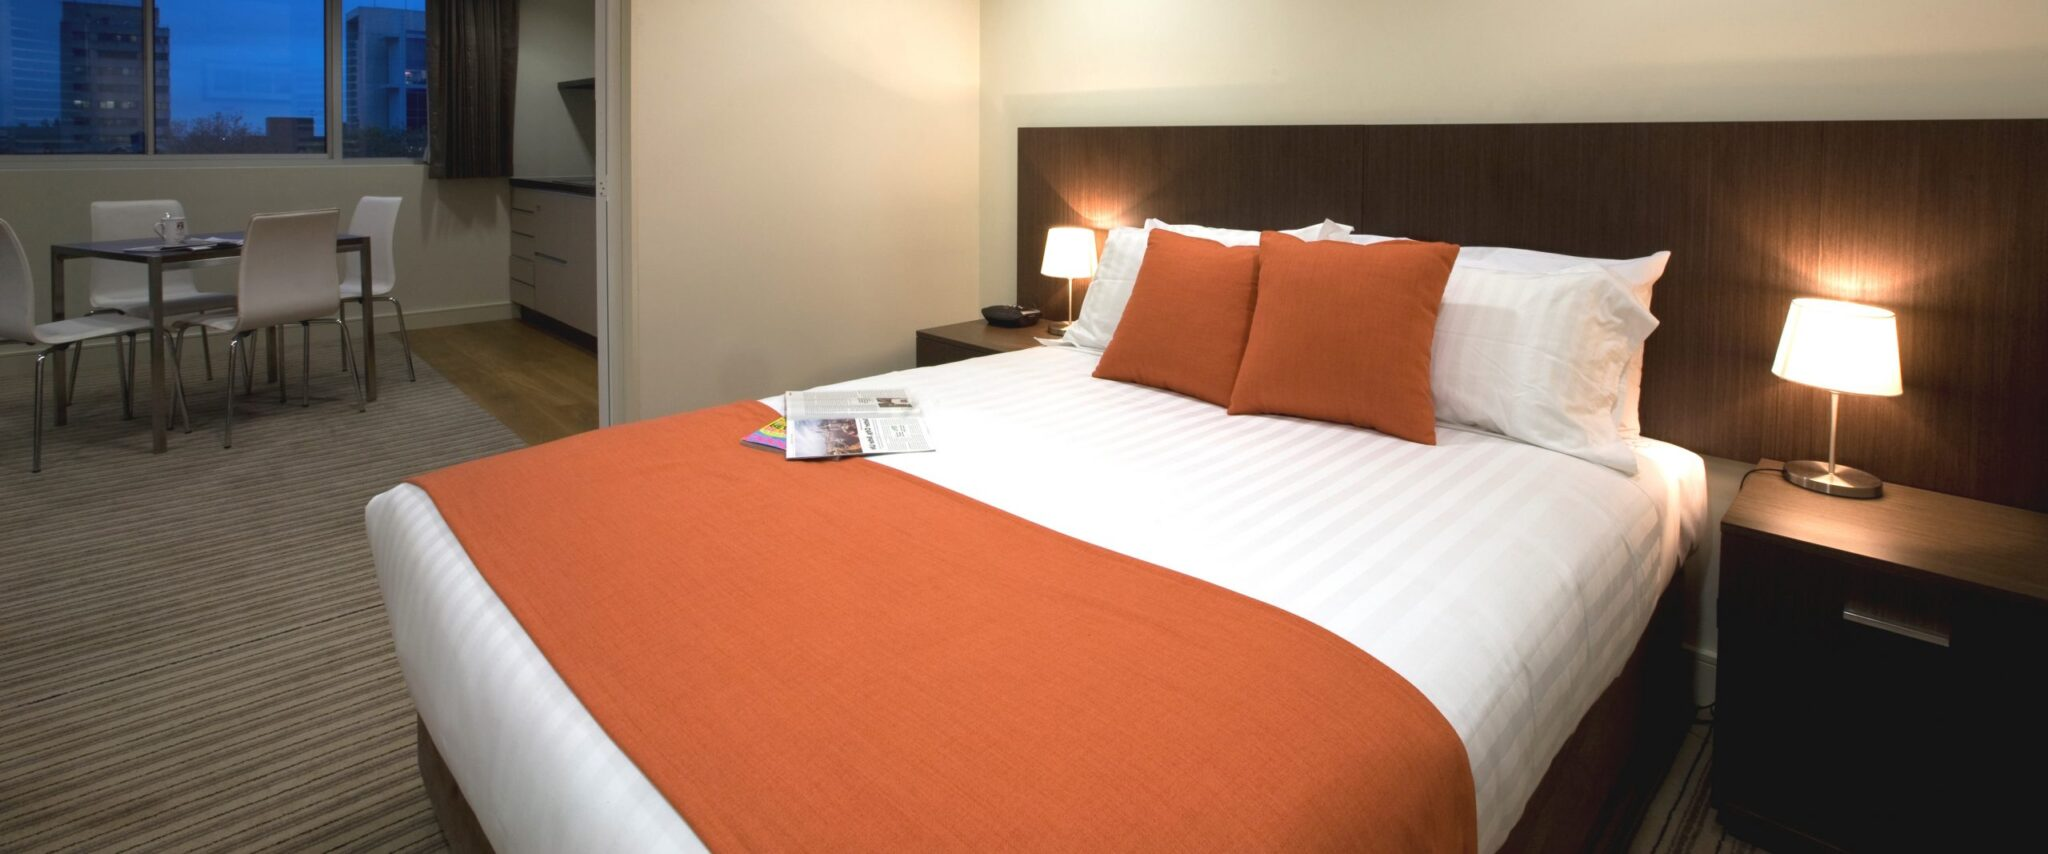 Accommodation for delegates Melbourne